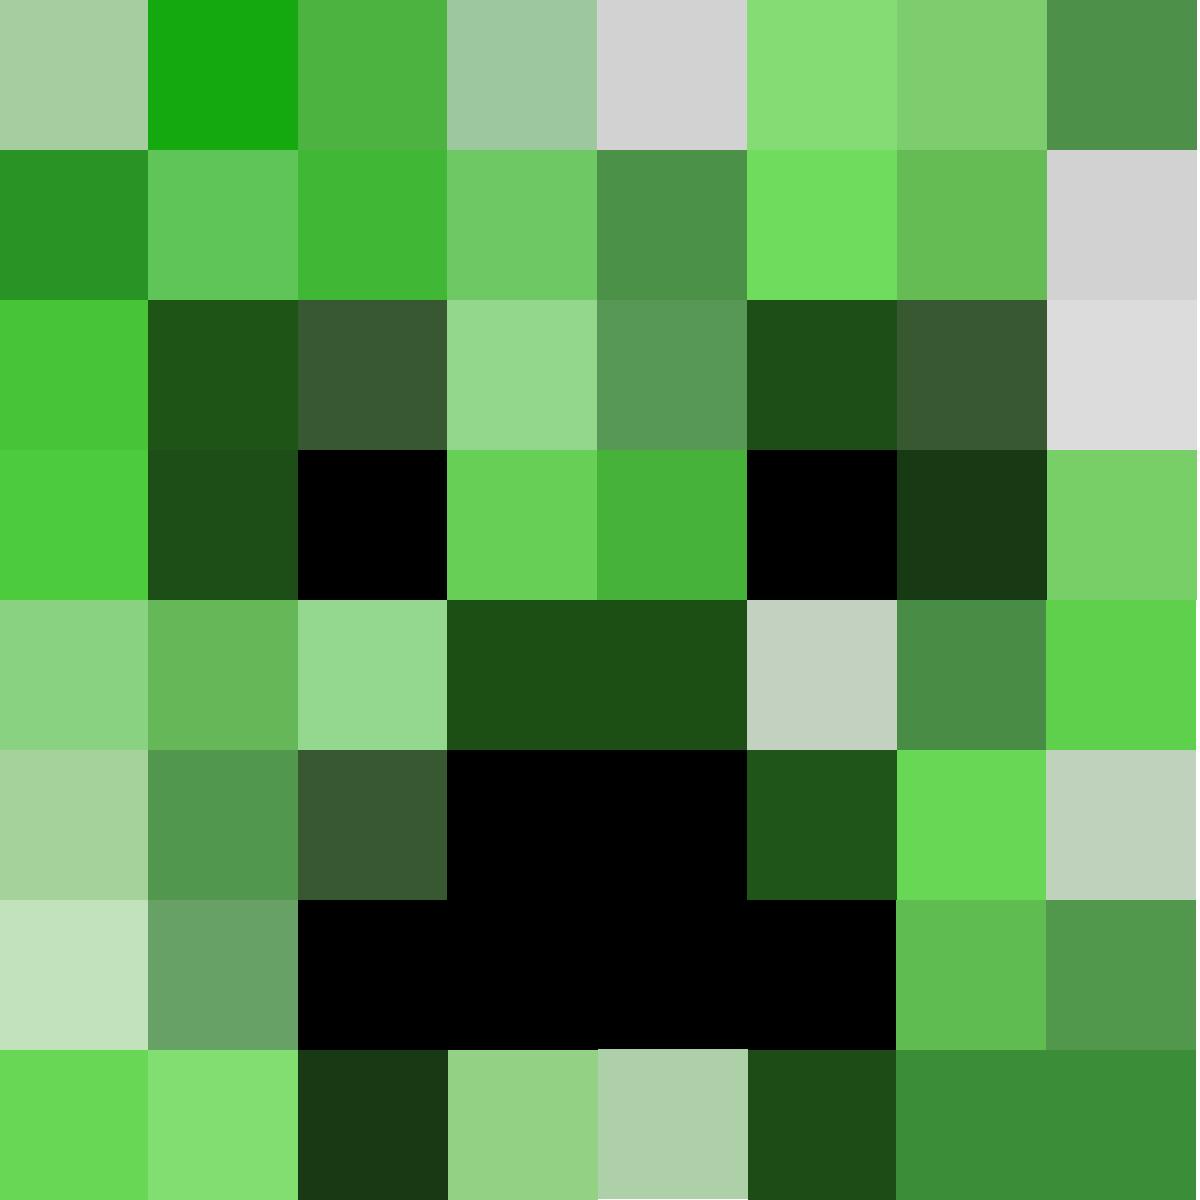 Zombie Minecraft Pixel Art Pixel Art Templates Pixel Art